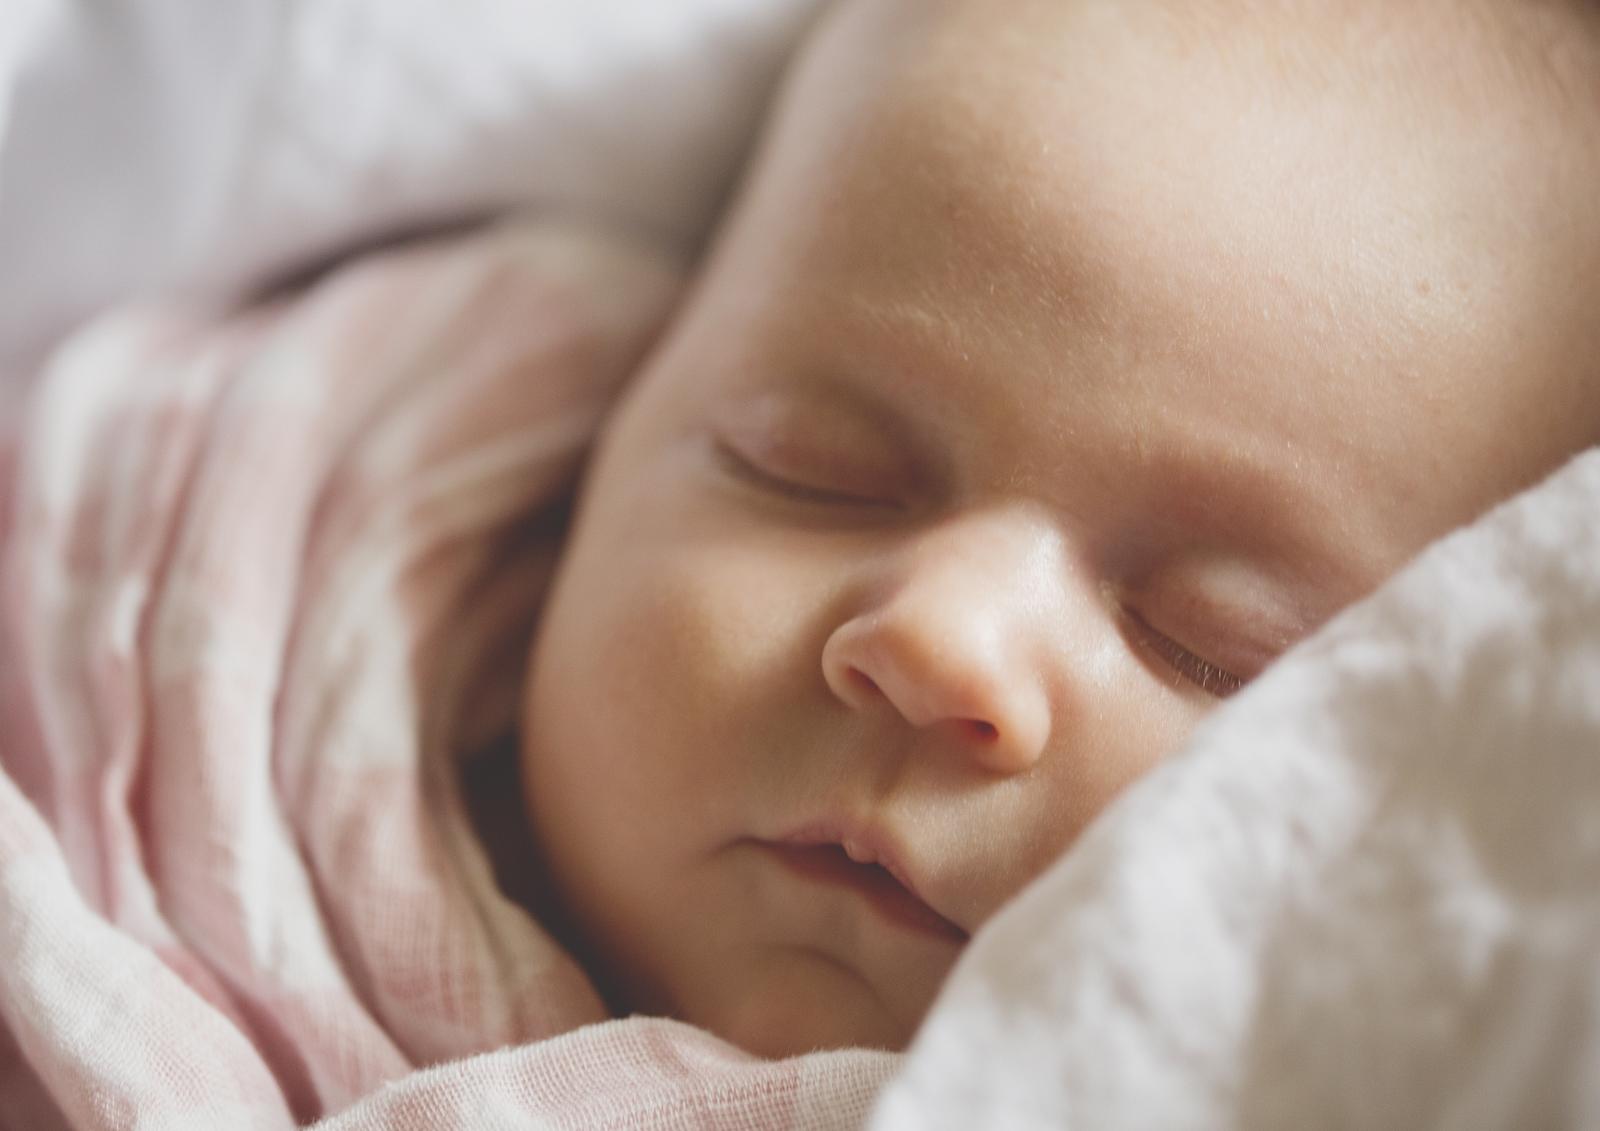 Newborn tiny details!